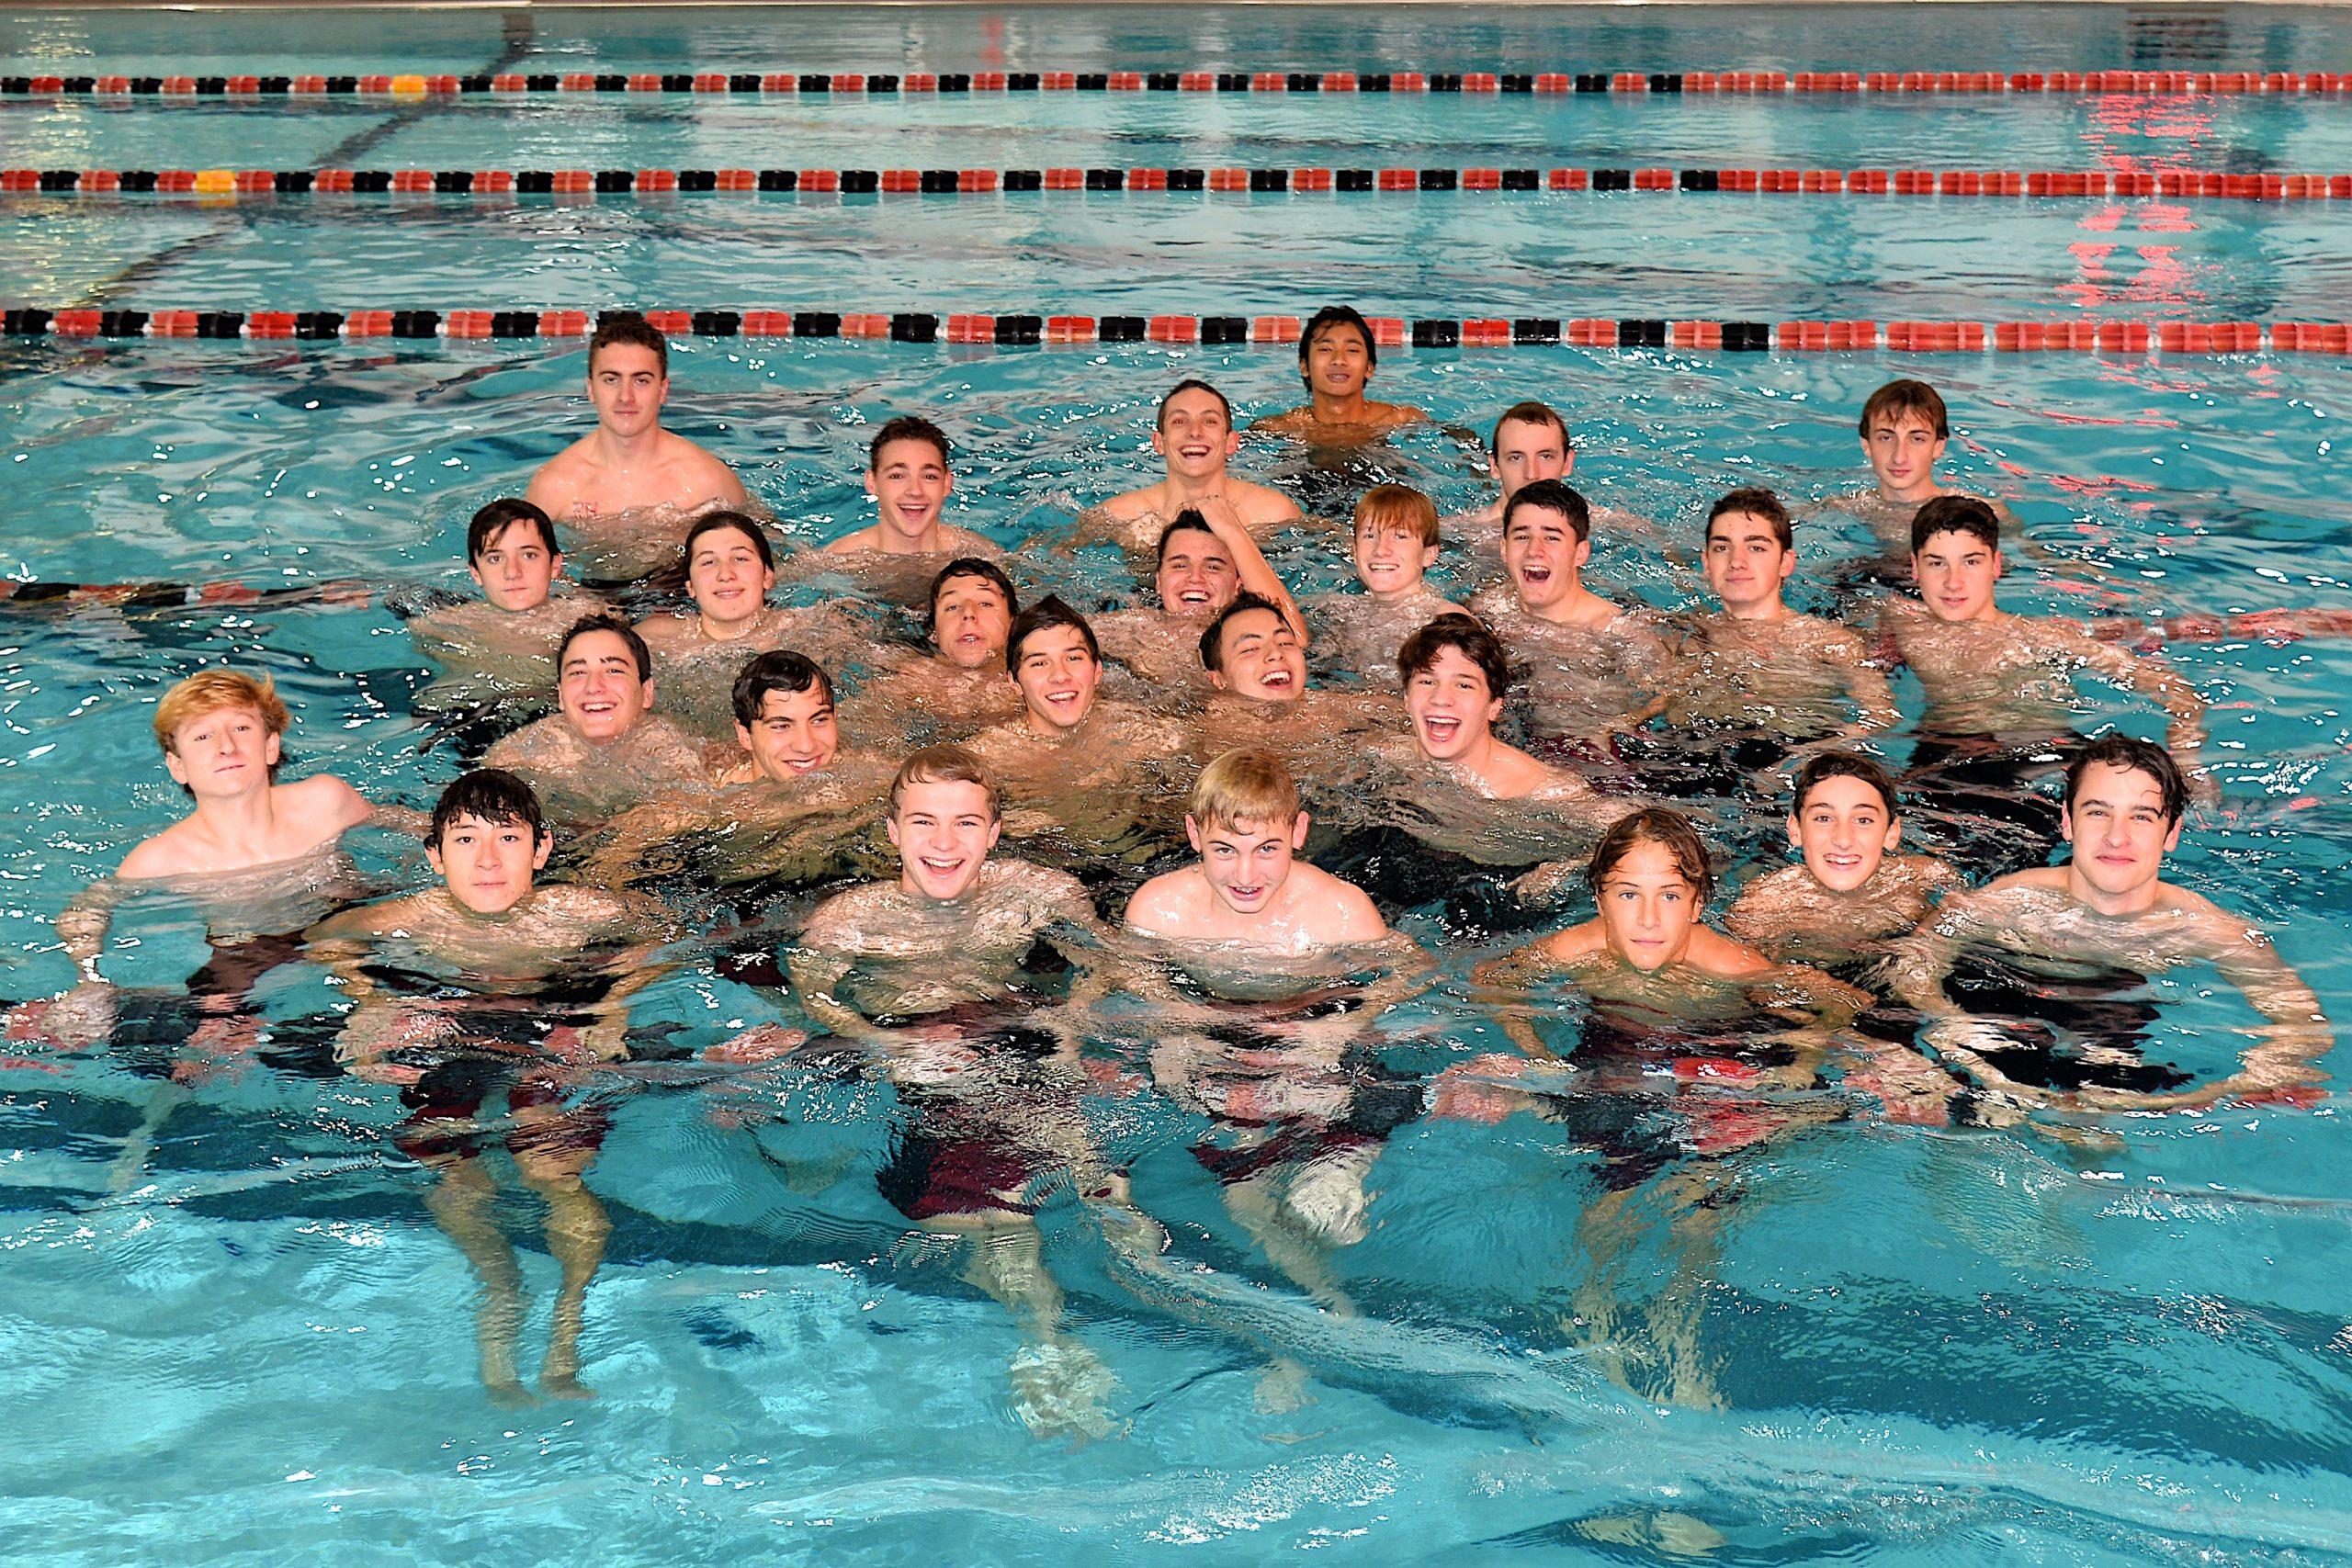 The East Hampton/Pierson/Bridgehampton boys swimming team prior to taking on Connetquot/East Islip on Thursday, December 5.